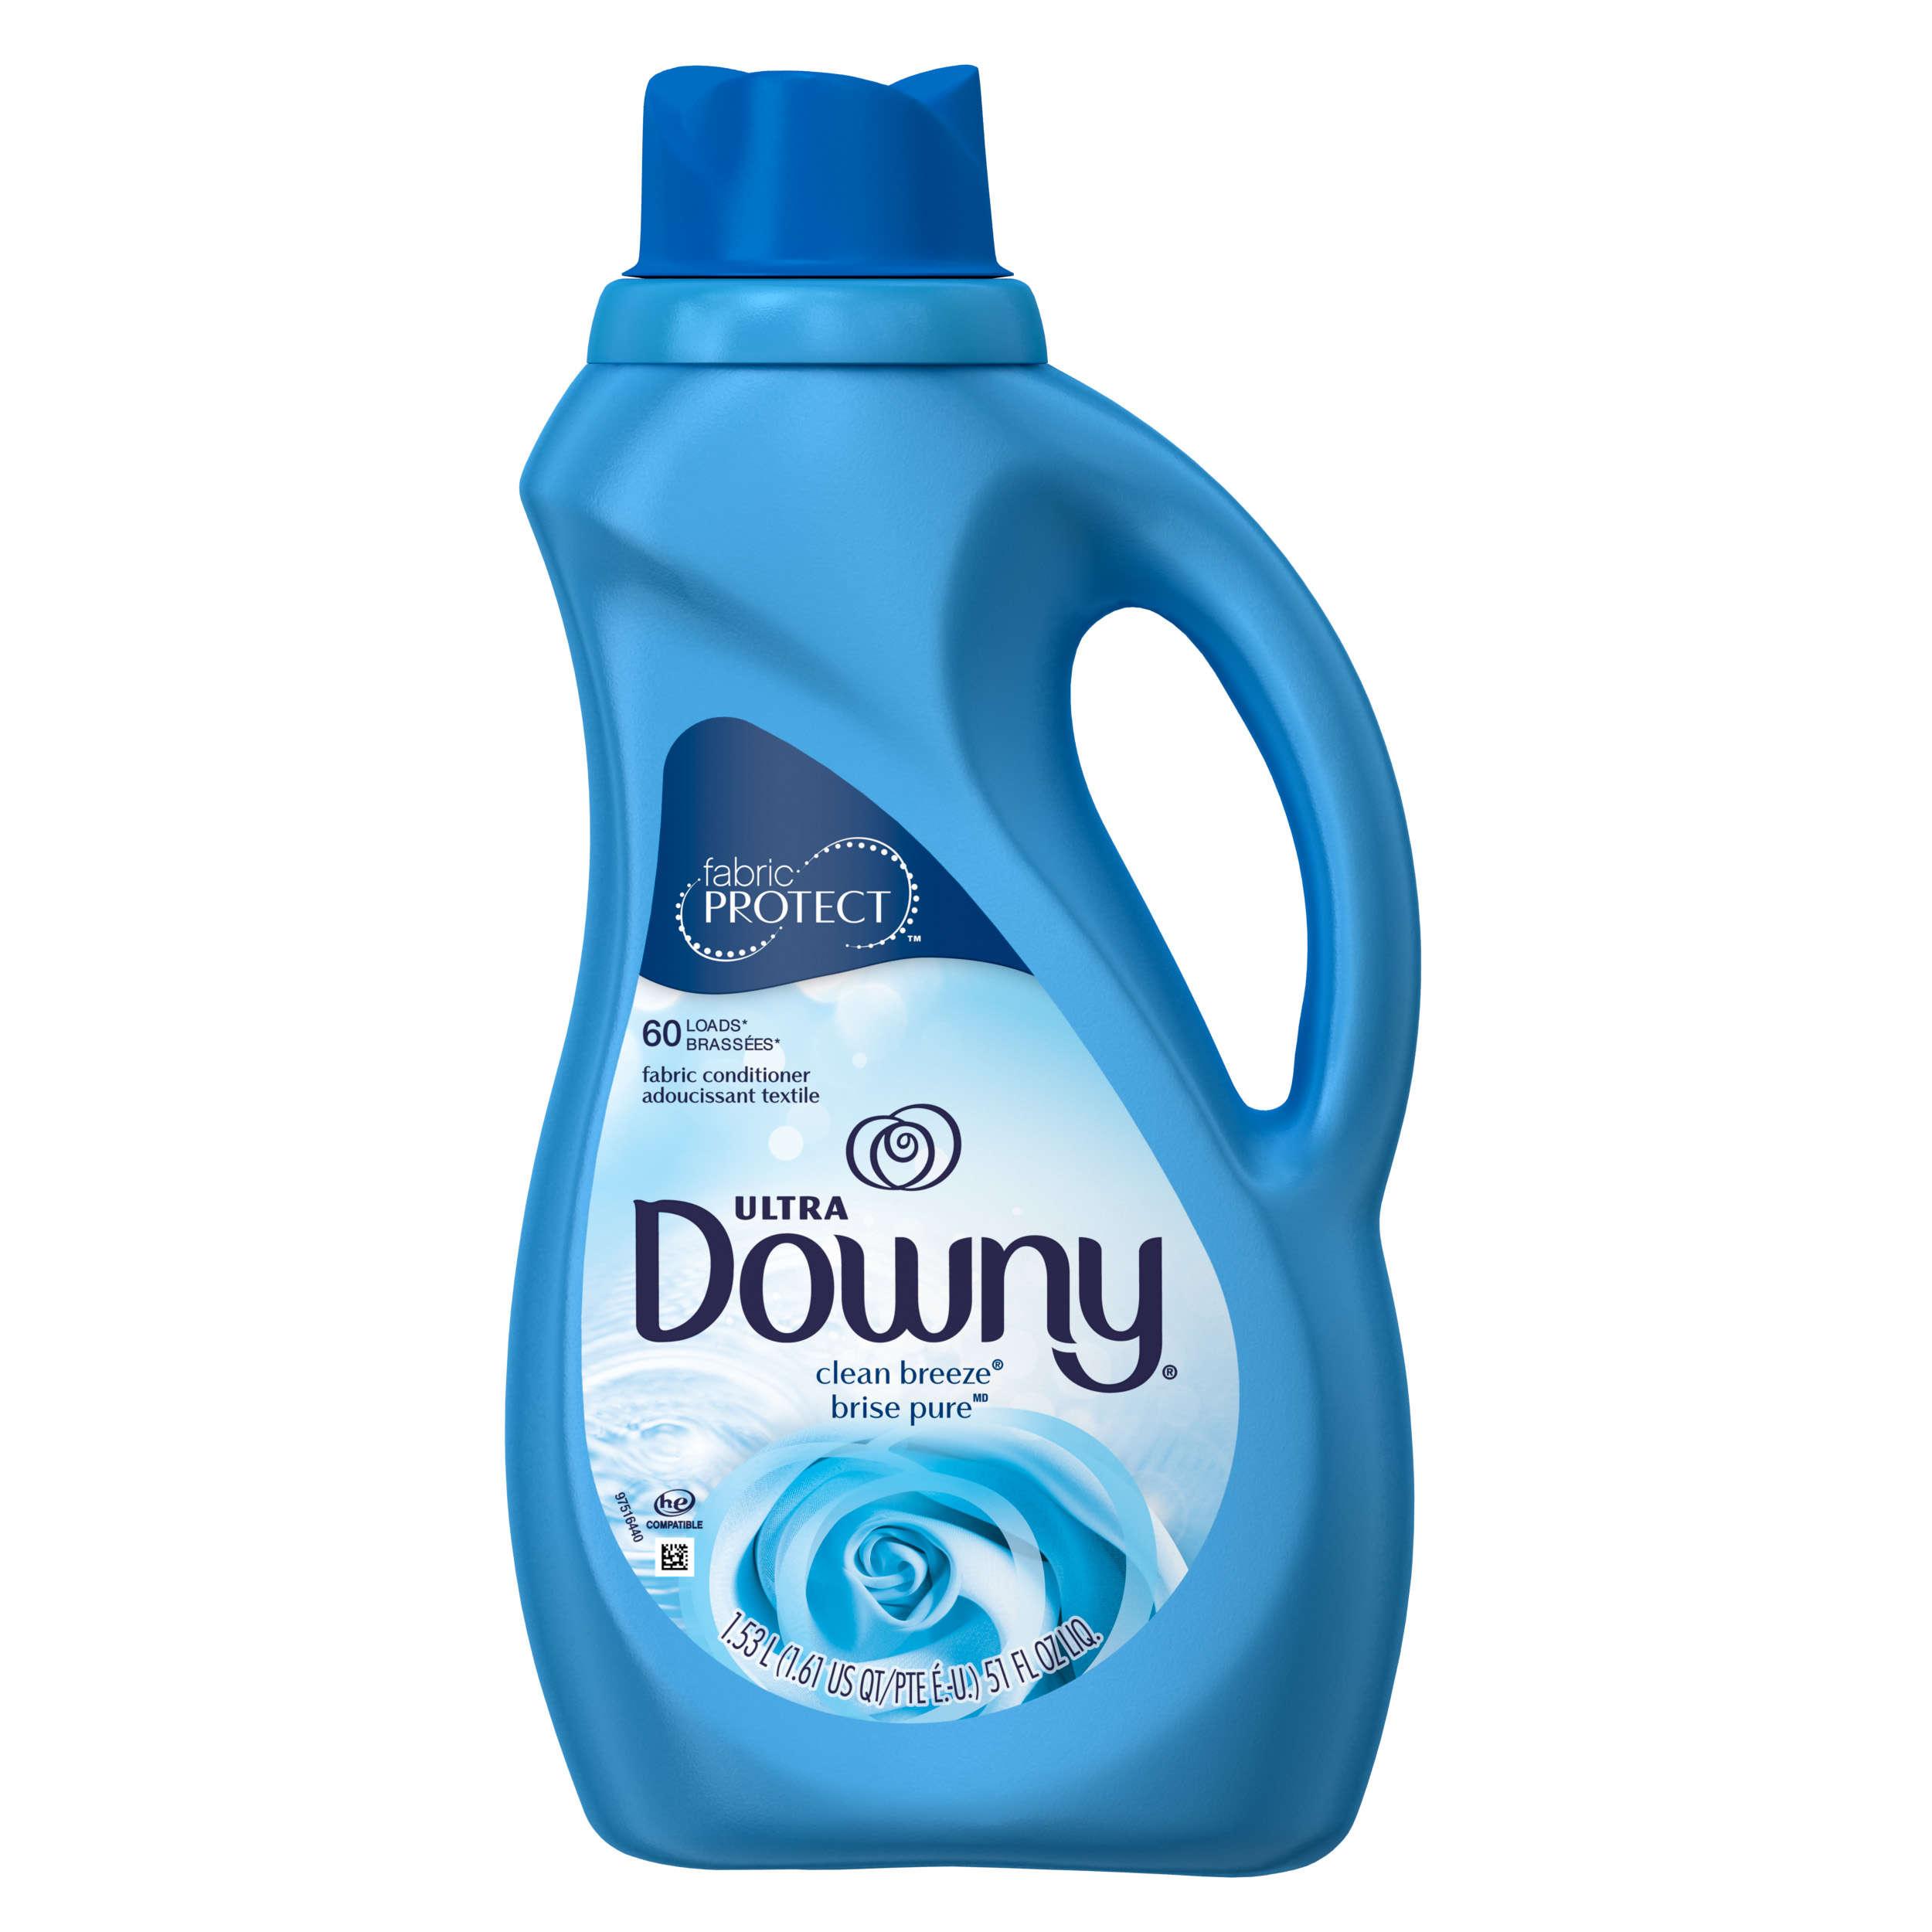 Downy Clean Breeze Liquid Fabric Conditioner (Fabric Softener), 51 FL OZ